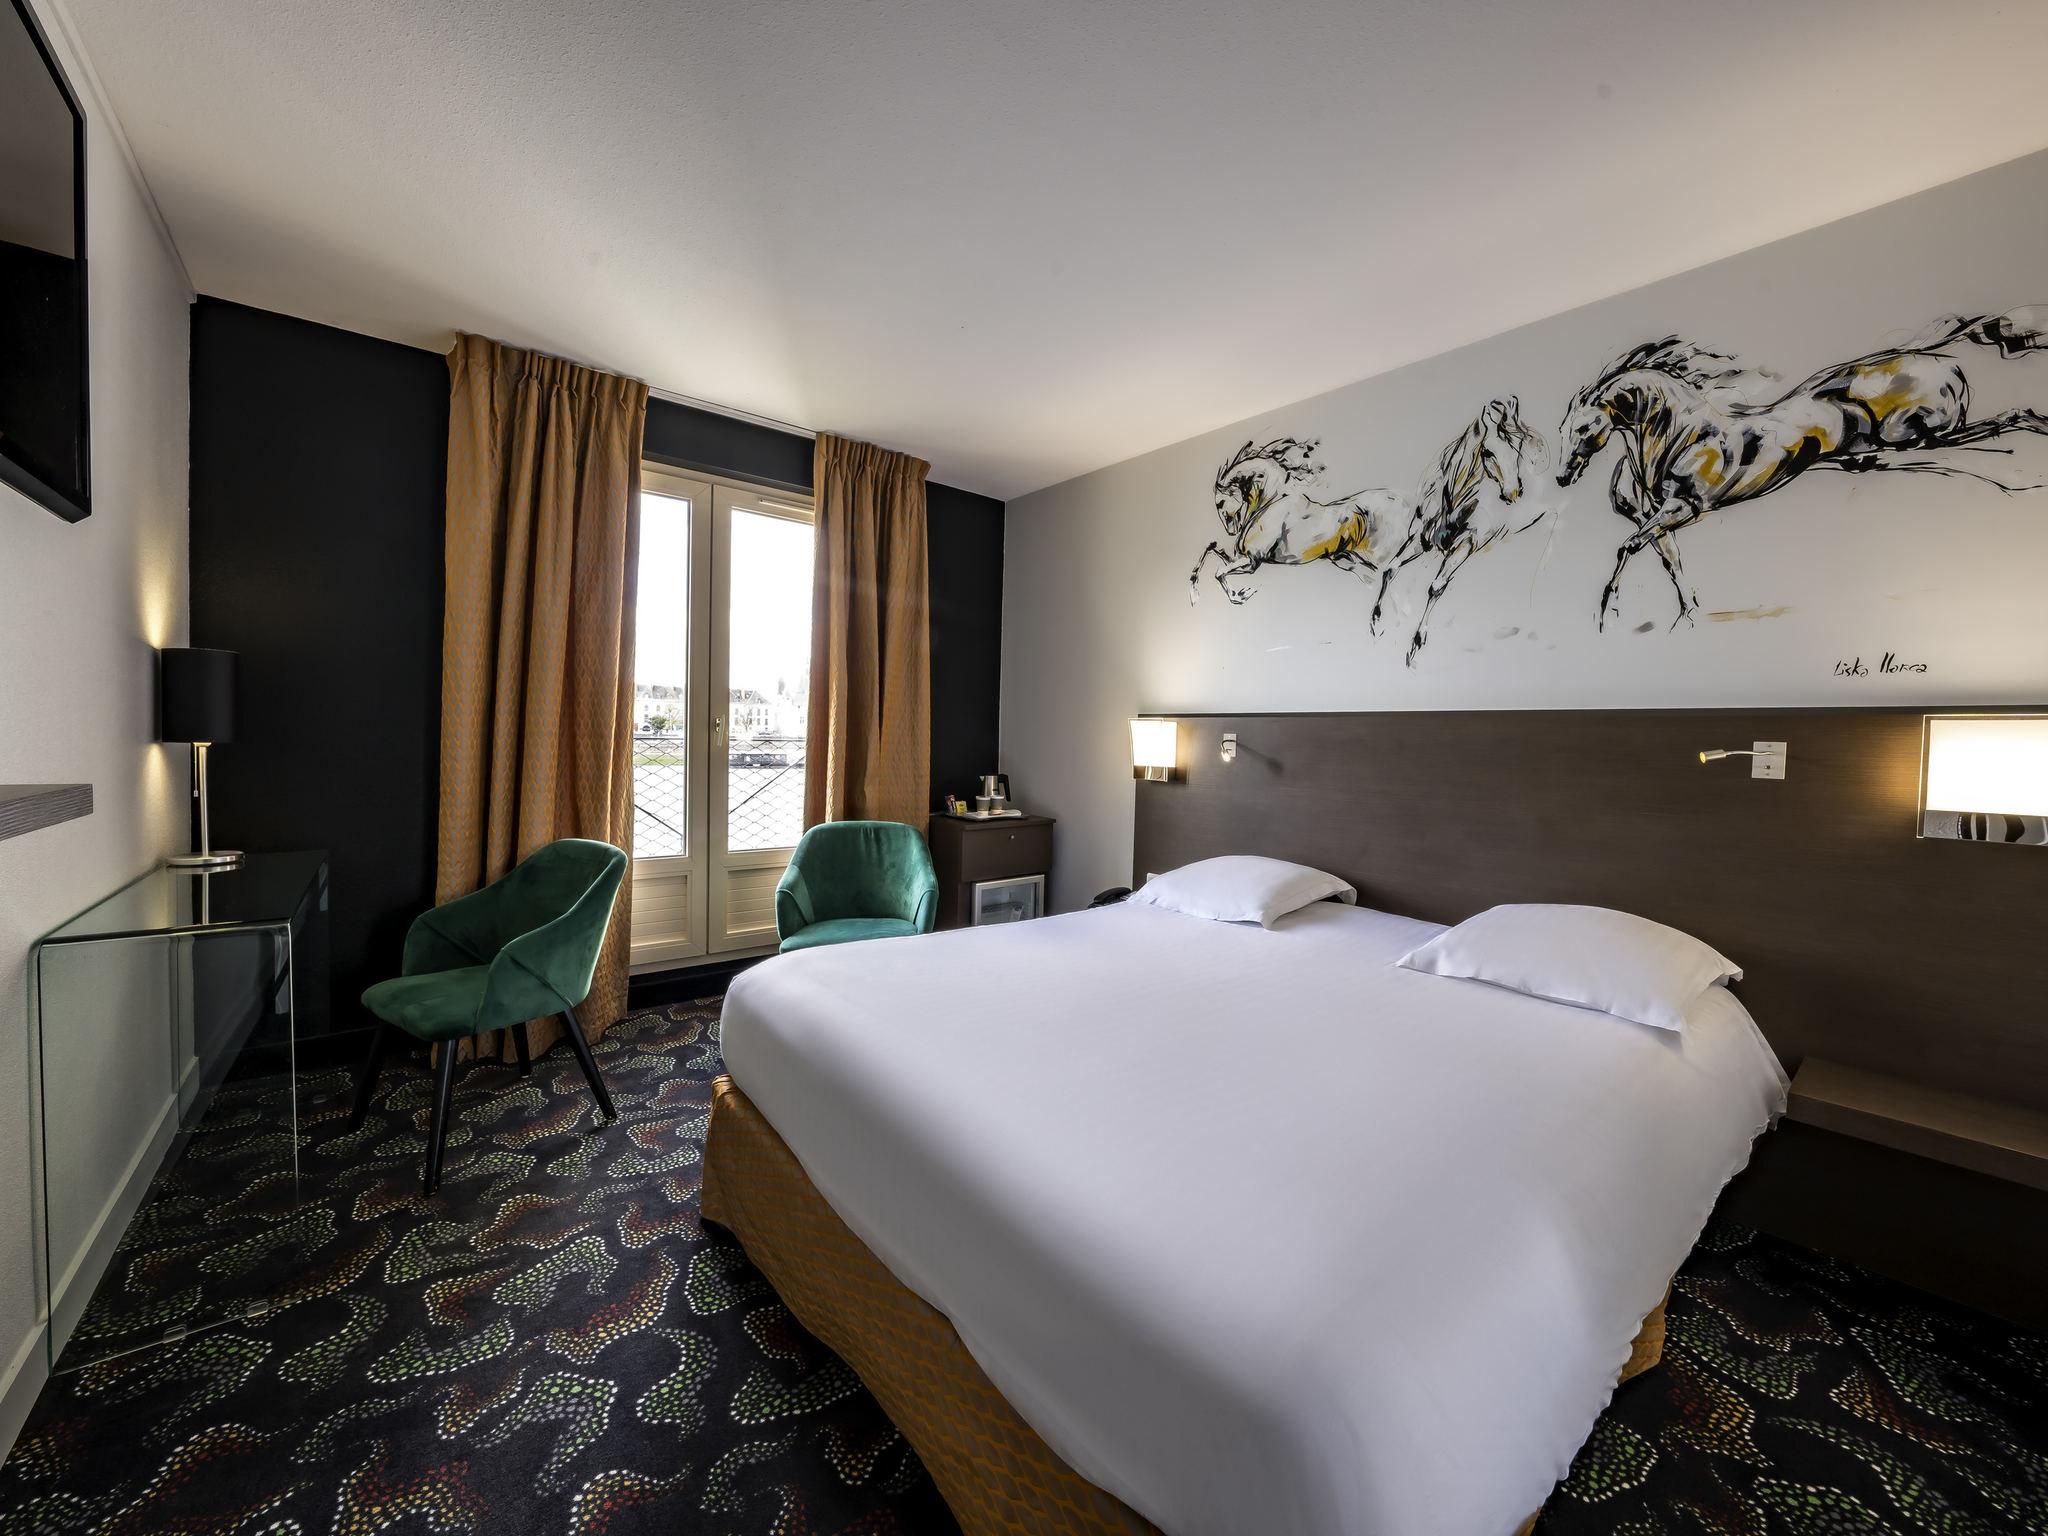 Hotel in saumur mercure bords de loire saumur hotel for Hotels saumur